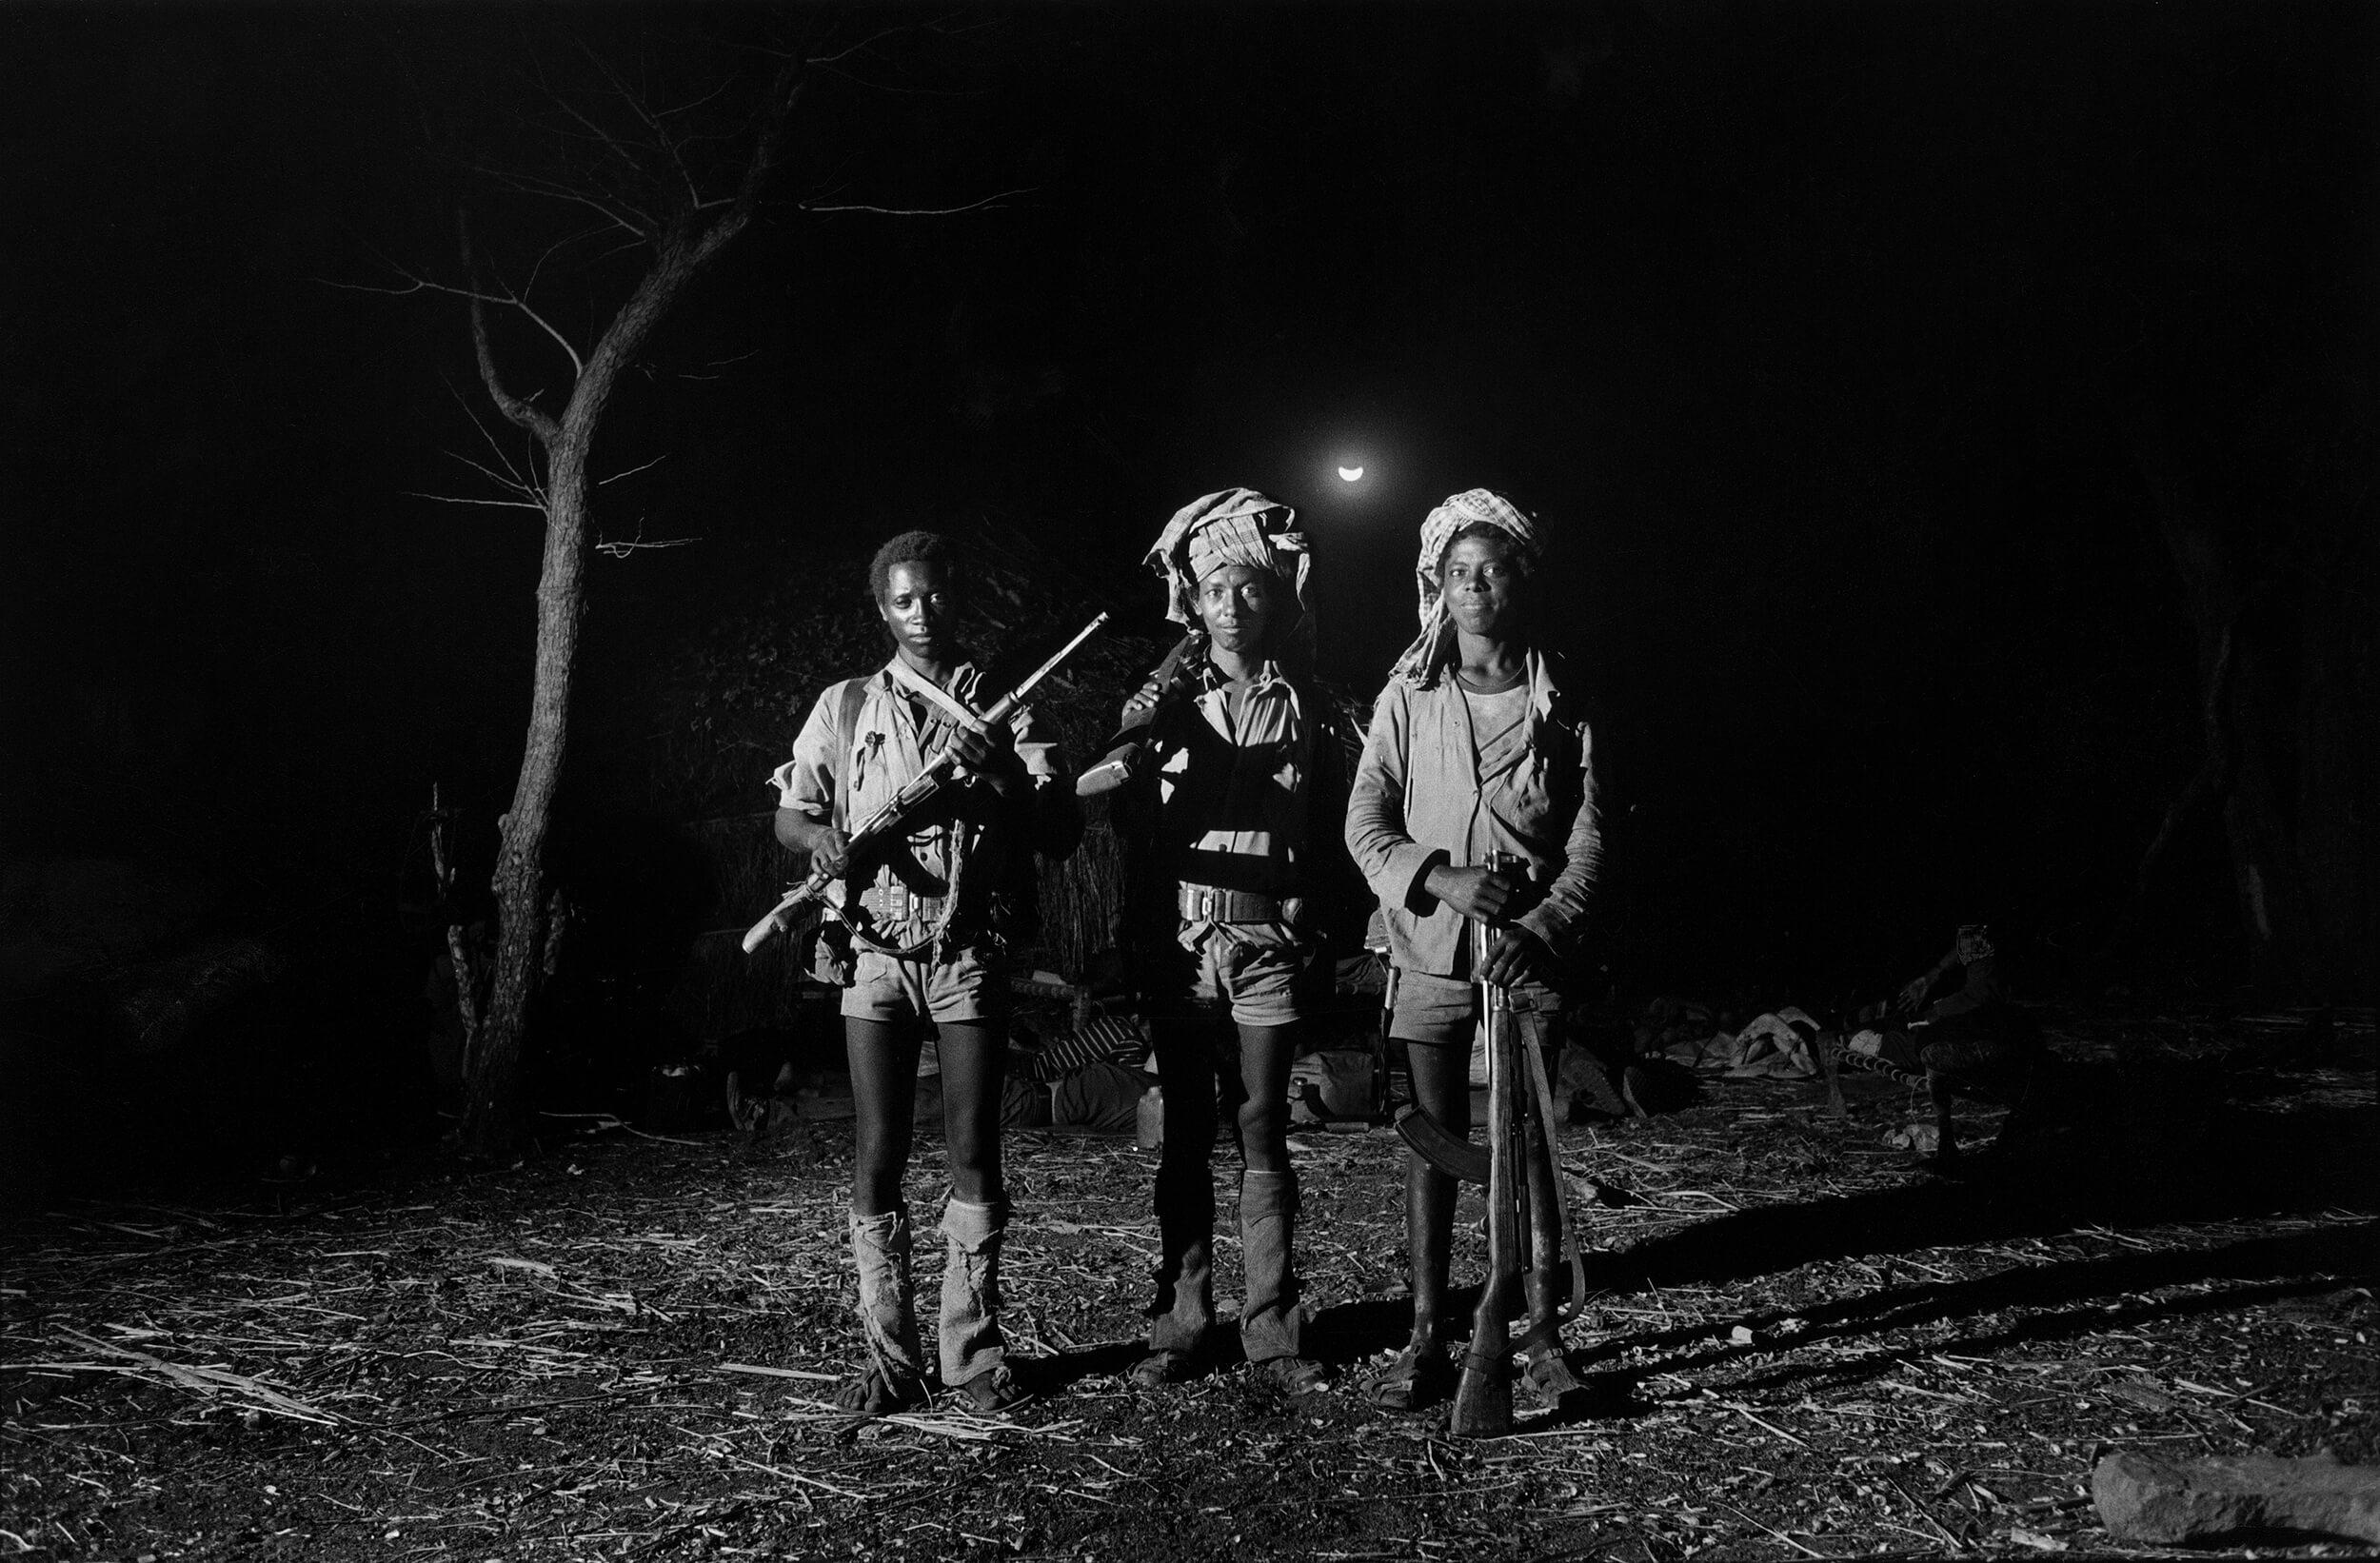 Gerilla warriors from the Ethiopian resistance group EPRP in Gondar Province 1987.